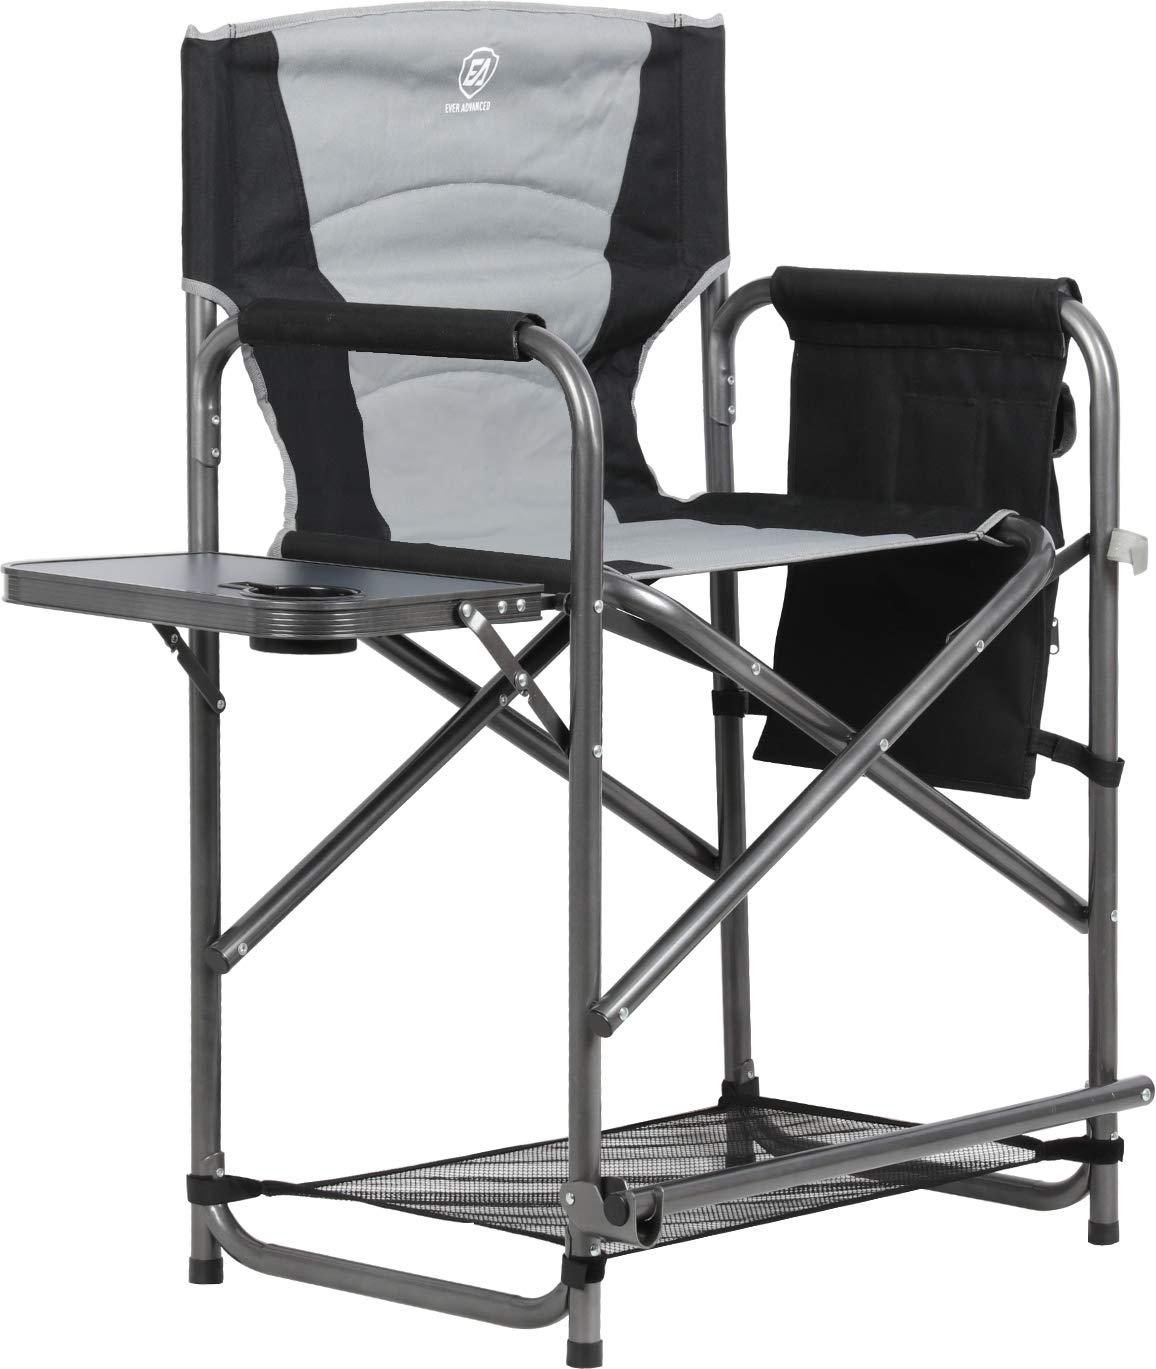 Makeup Chair Artist Professional Foldable Directors Light Black Folding Cosmetic